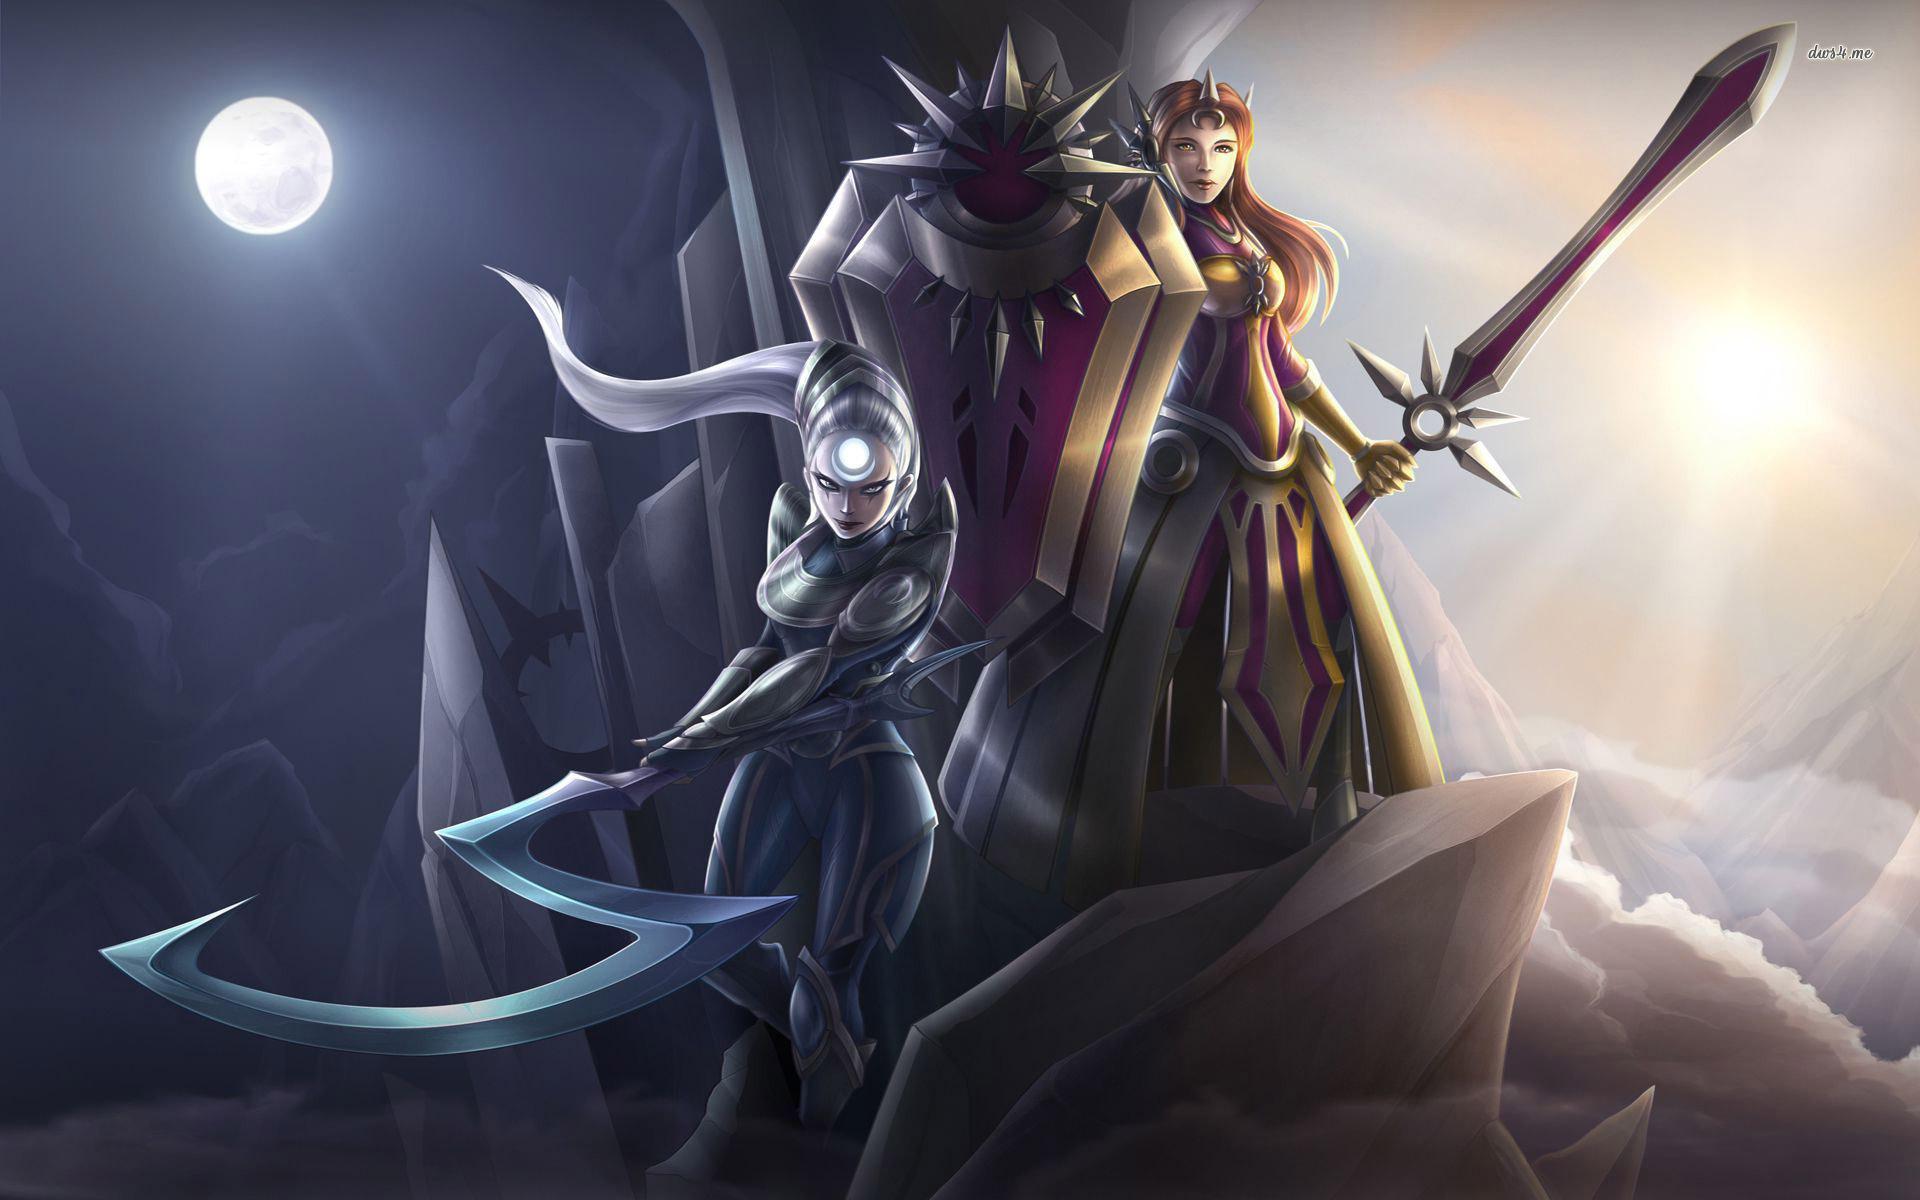 Leona And Diana League Of Legends Wallpaper Hd Leona Diana